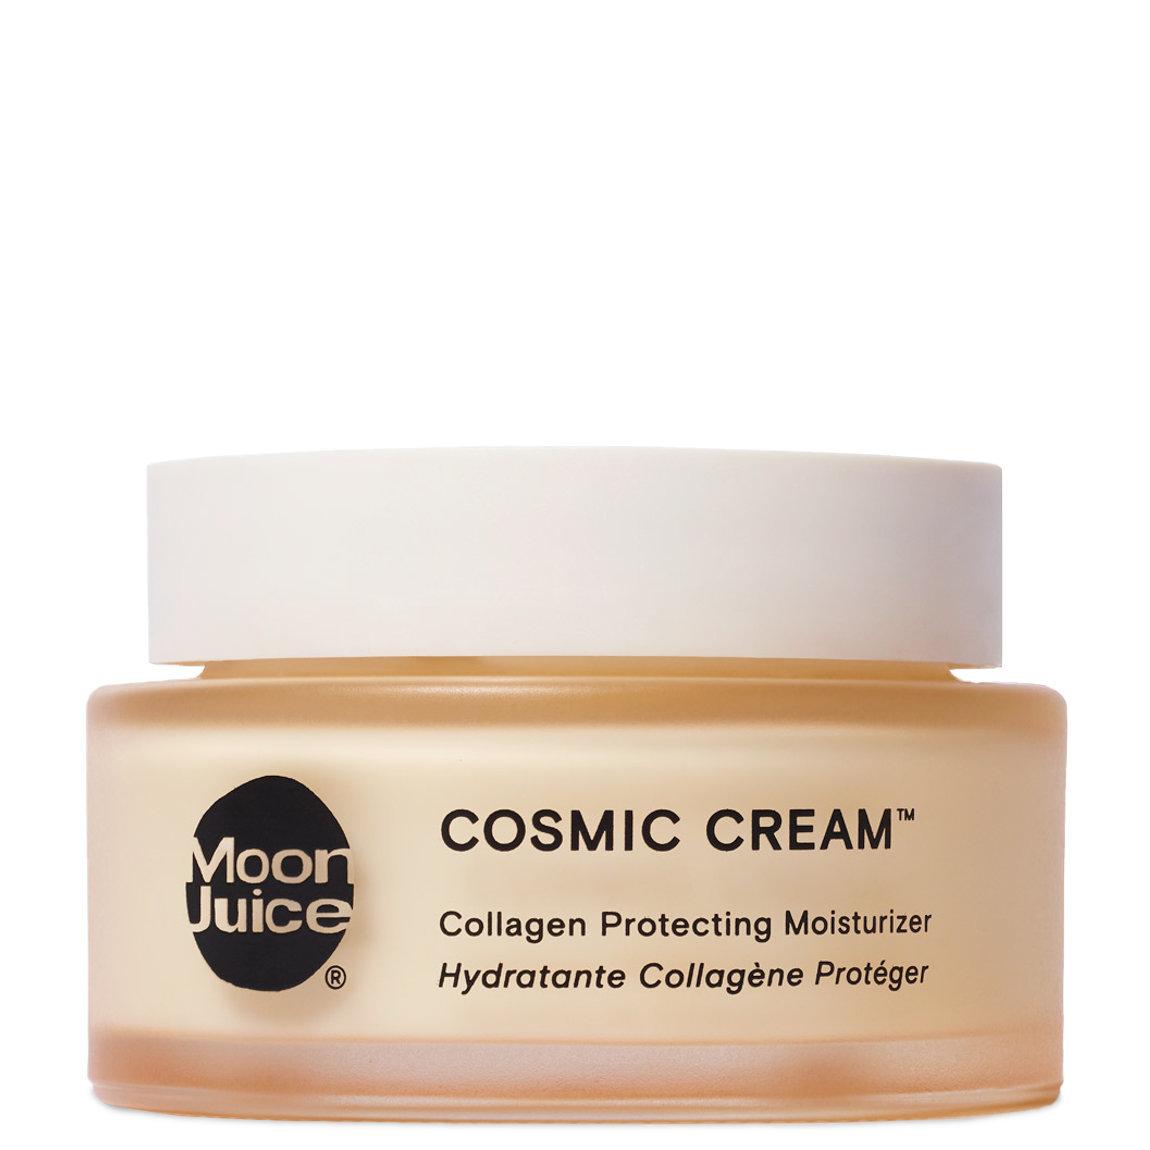 Moon Juice Cosmic Cream Collagen Protecting Moisturizer alternative view 1 - product swatch.